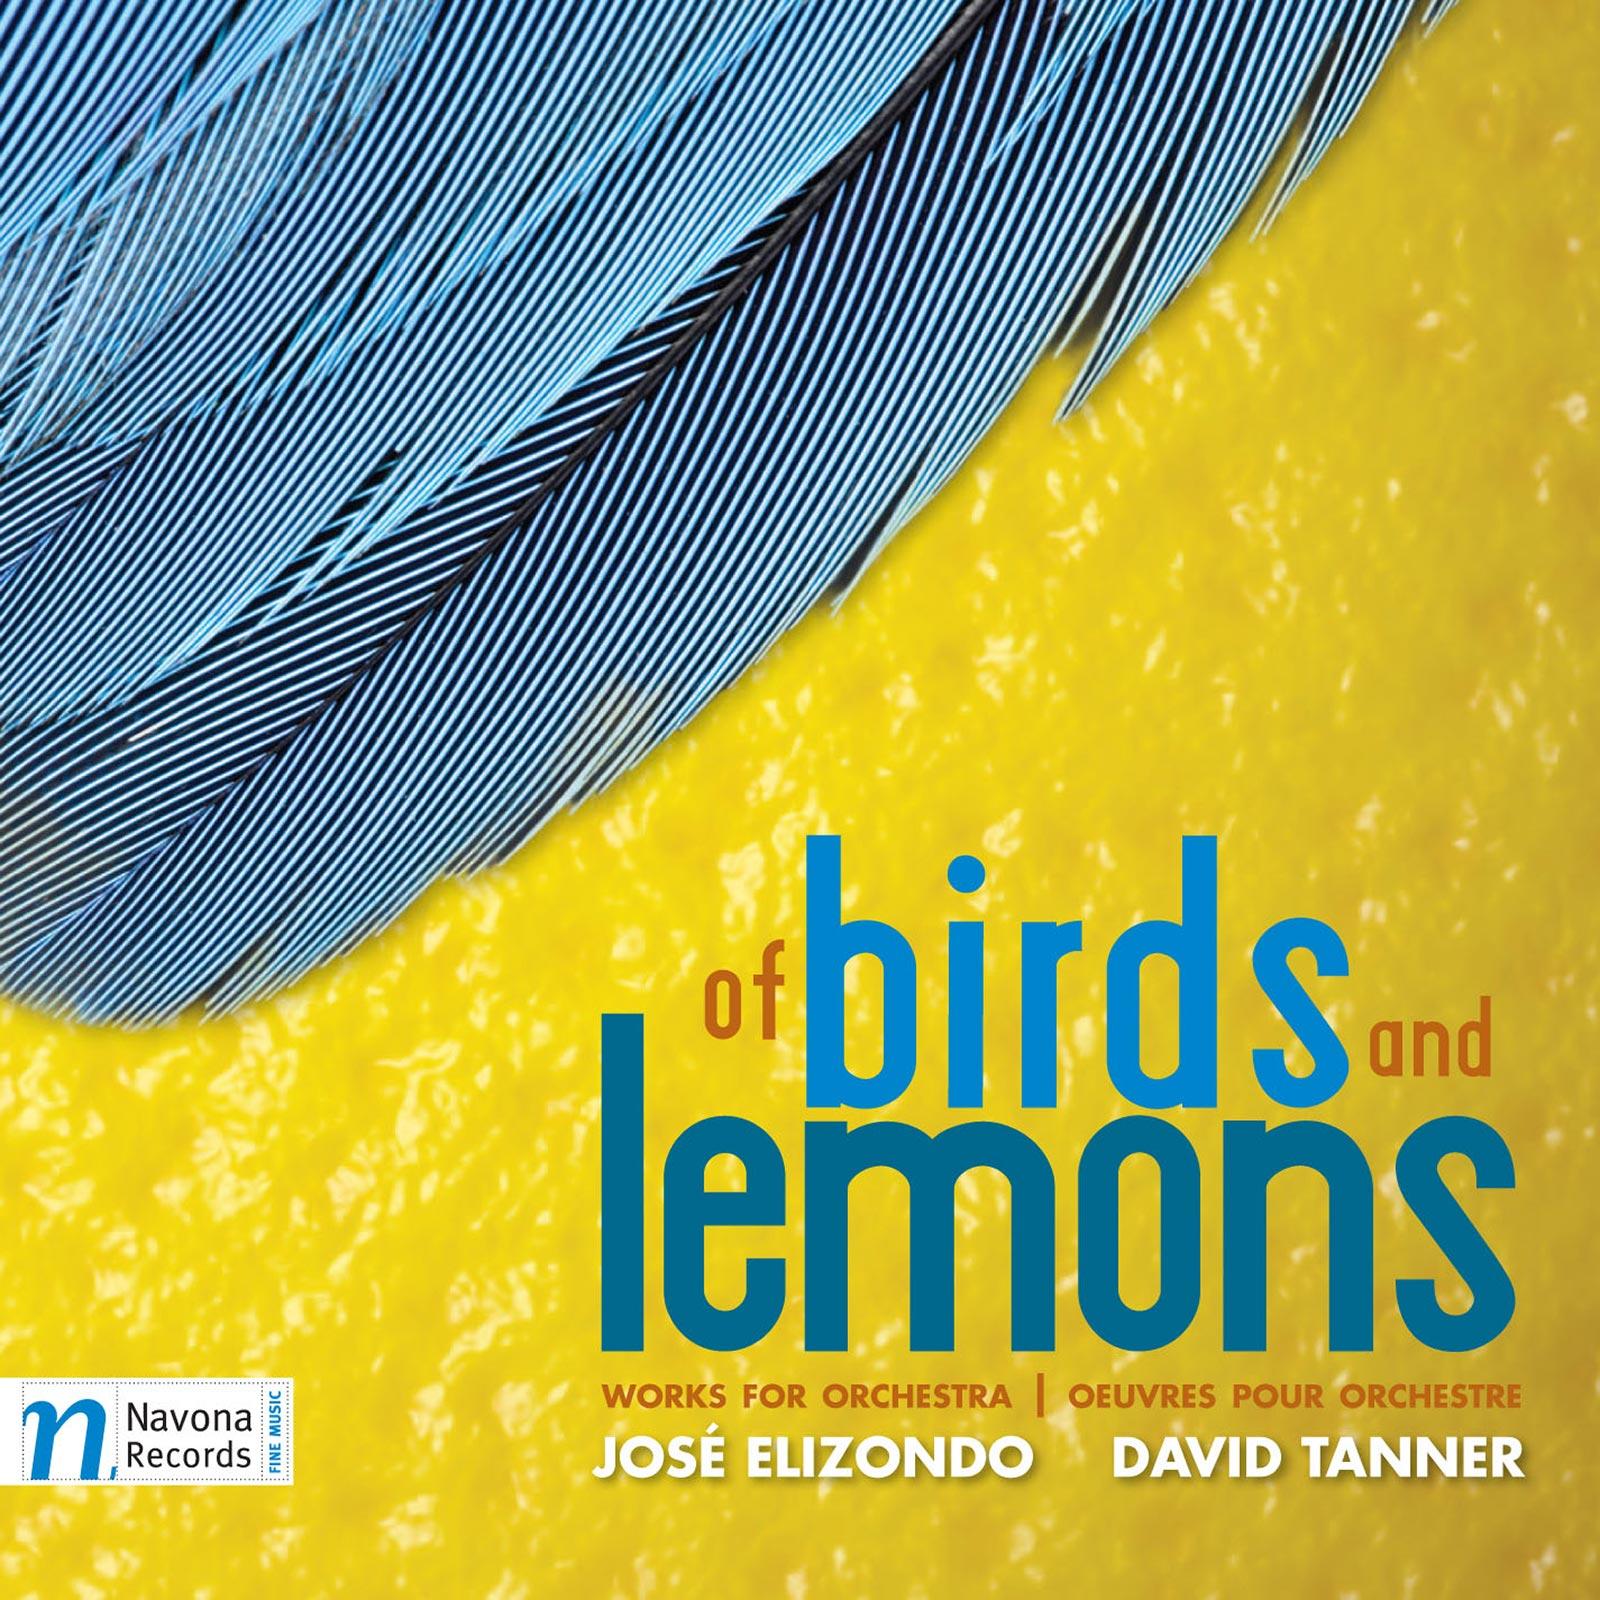 Of Birds and Lemons